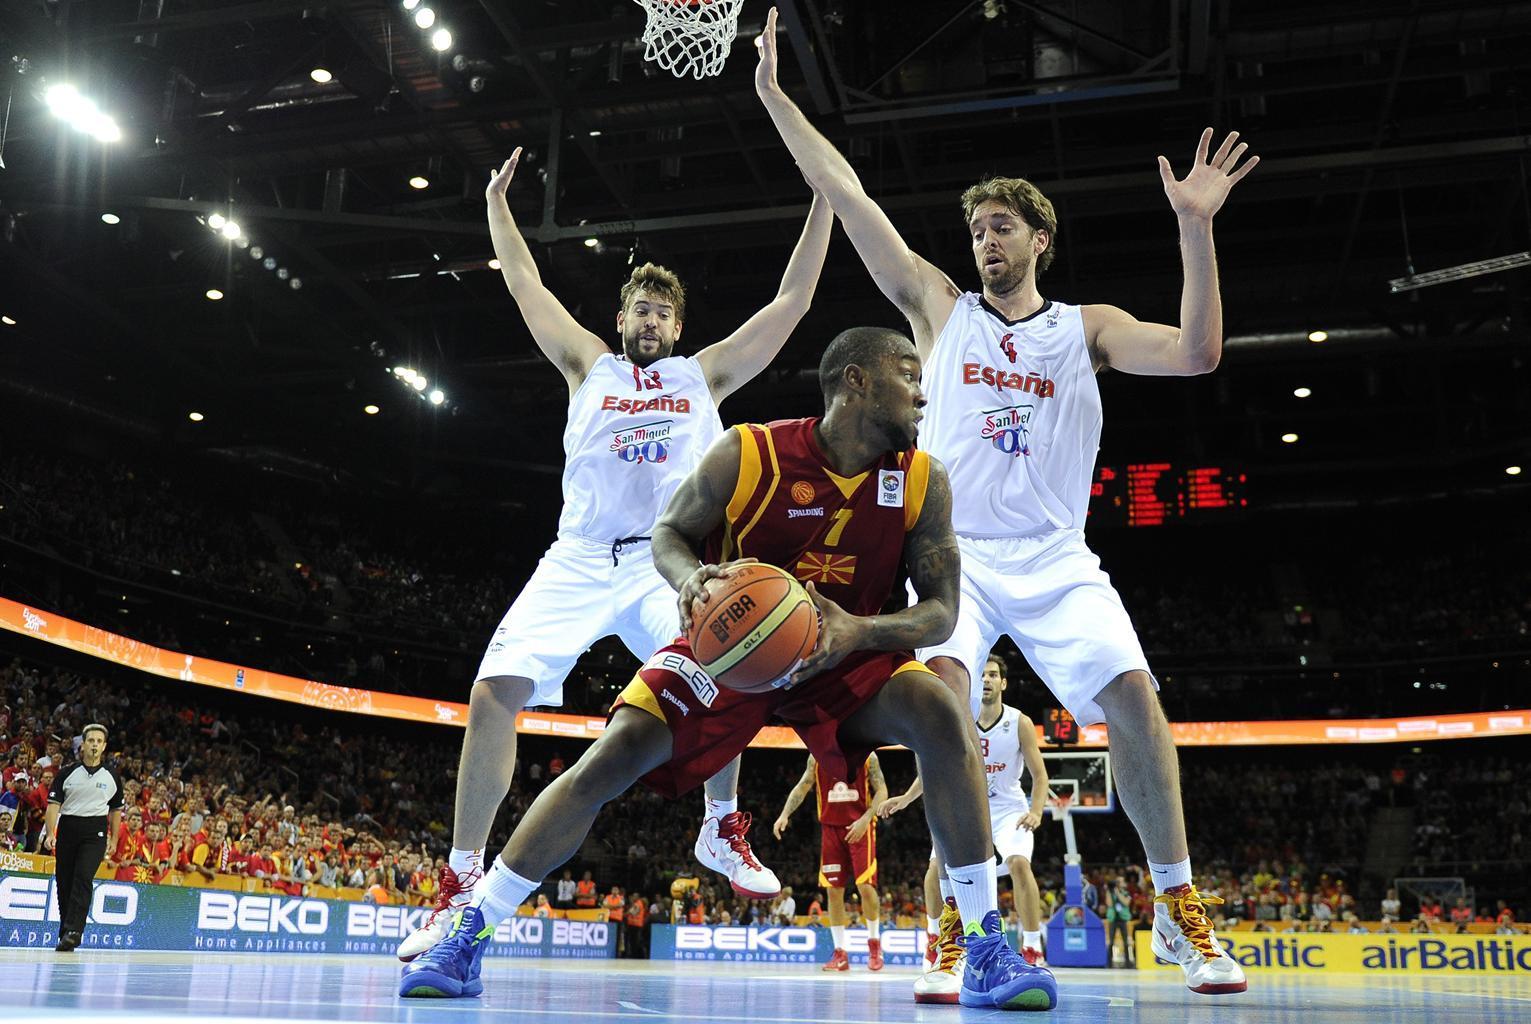 basketball-eurobasket-spainpg-vertical-extralarge